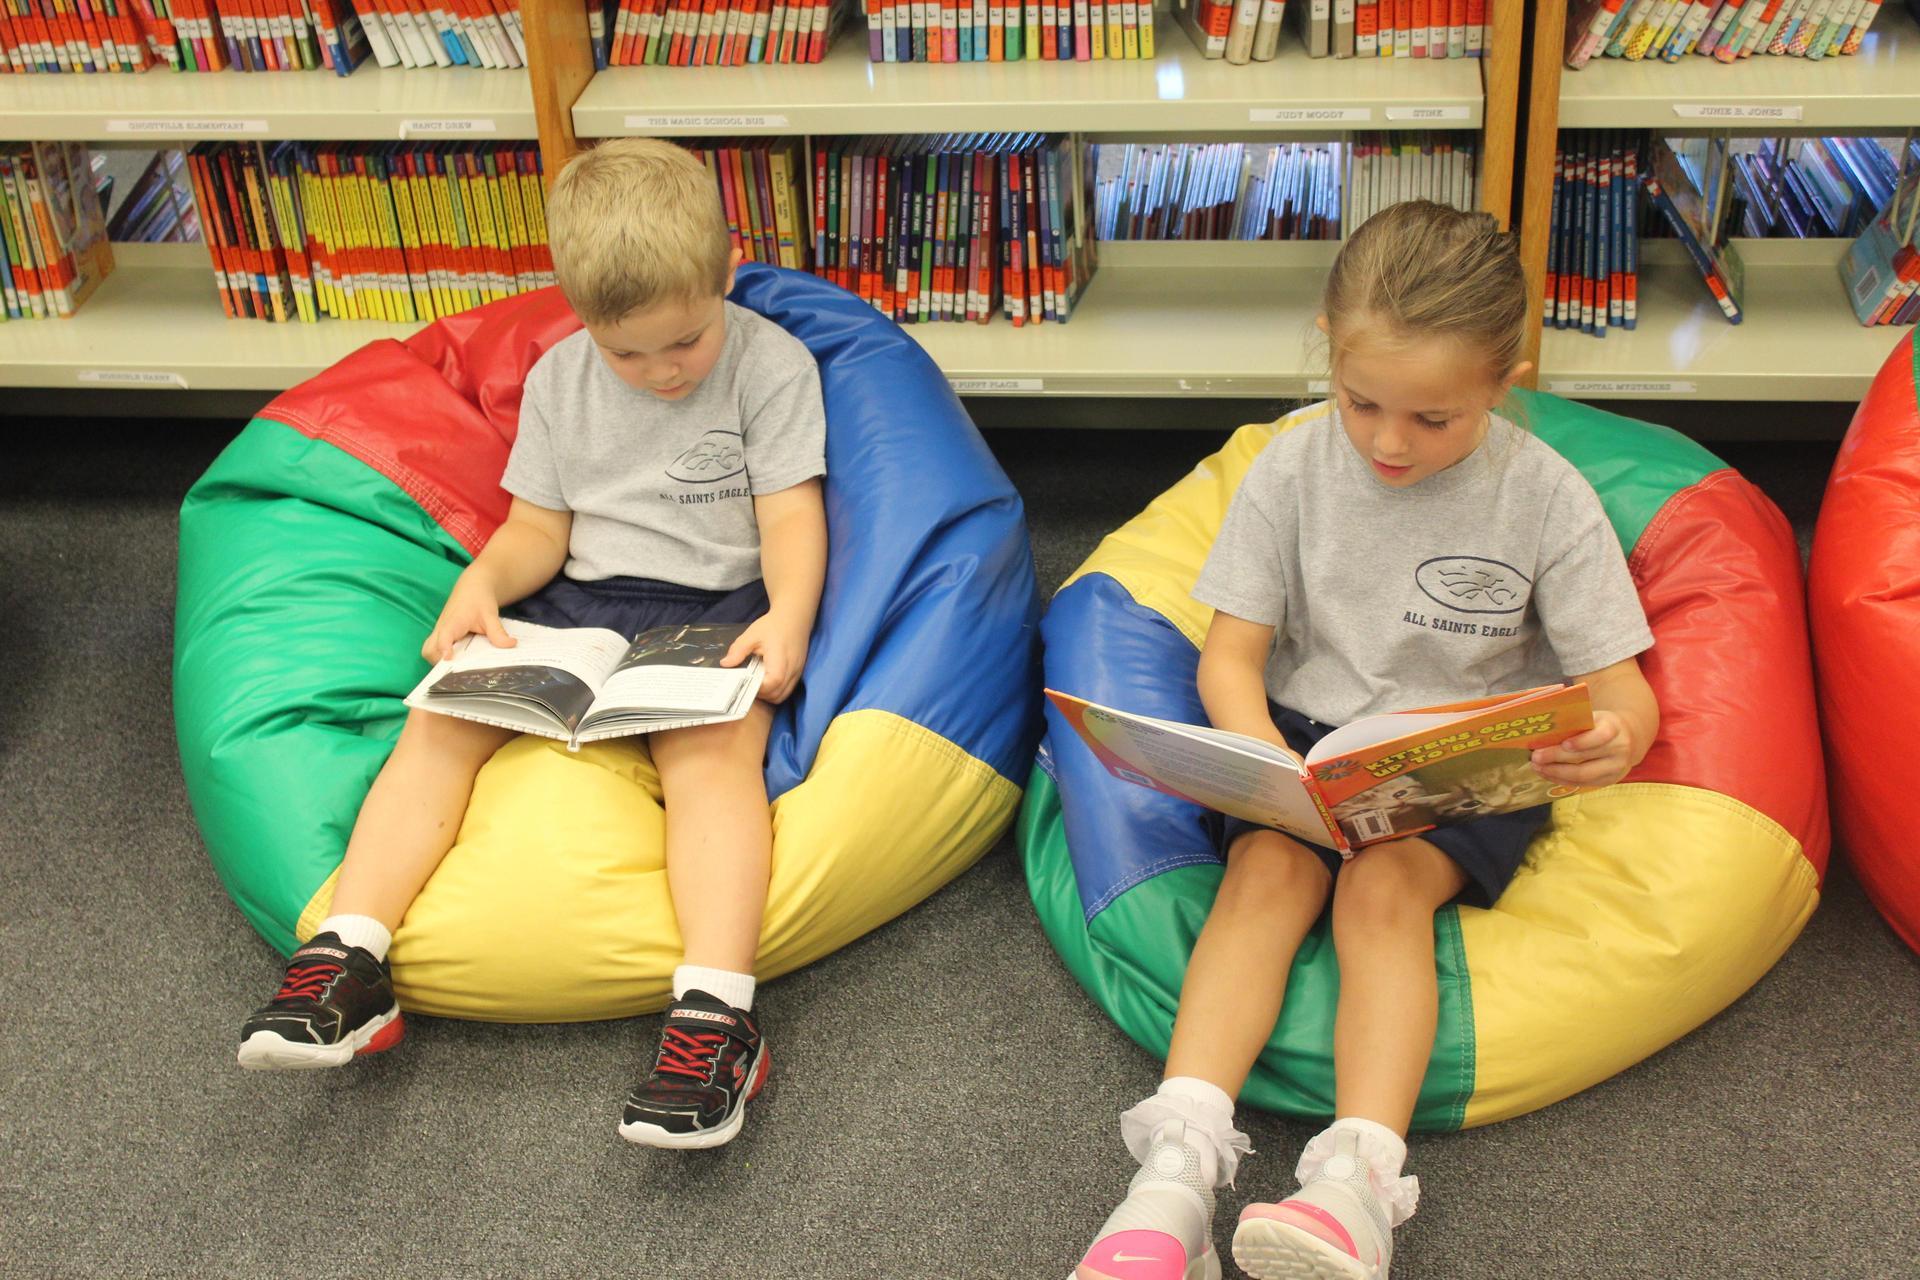 Reading in the Media Center